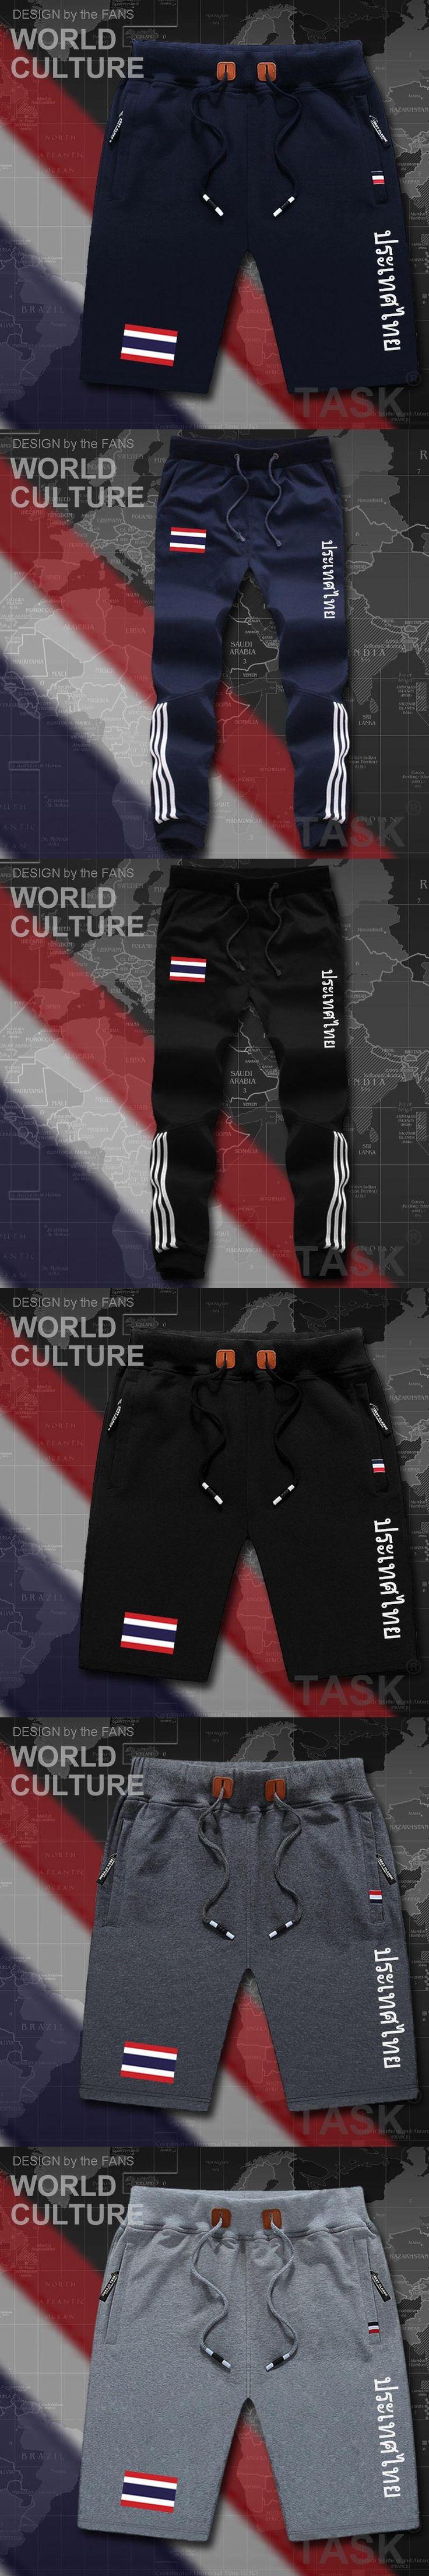 Thailand mens shorts beach new men's board shorts flag workout zipper pocket sweat bodybuilding knee cotton country Thai TH